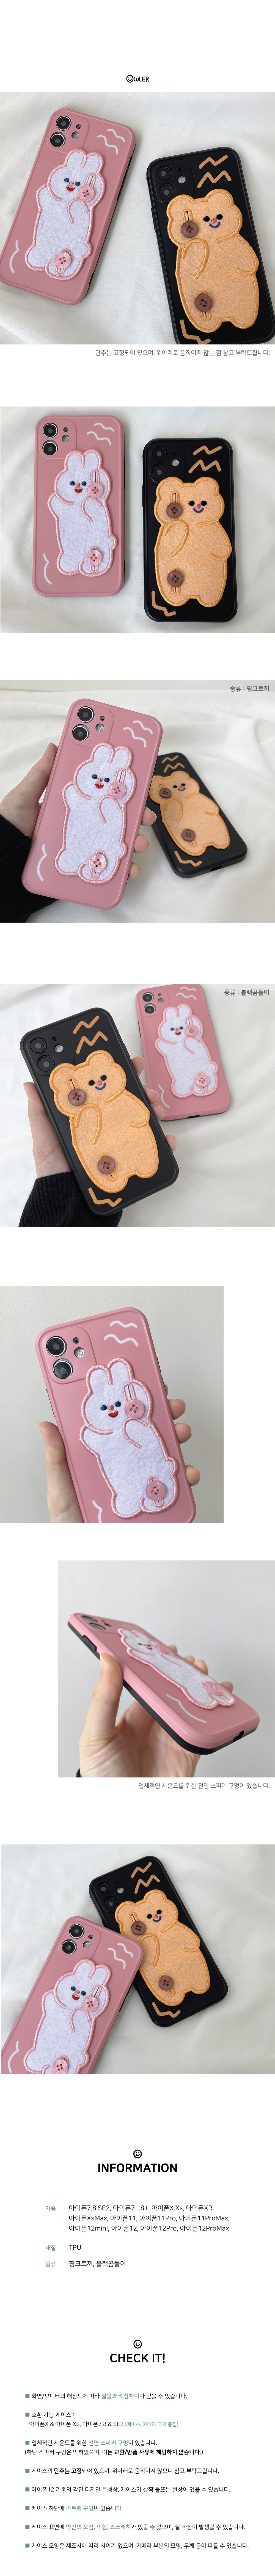 Button Rabbit Bear Wapen Full Cover iPhone Case